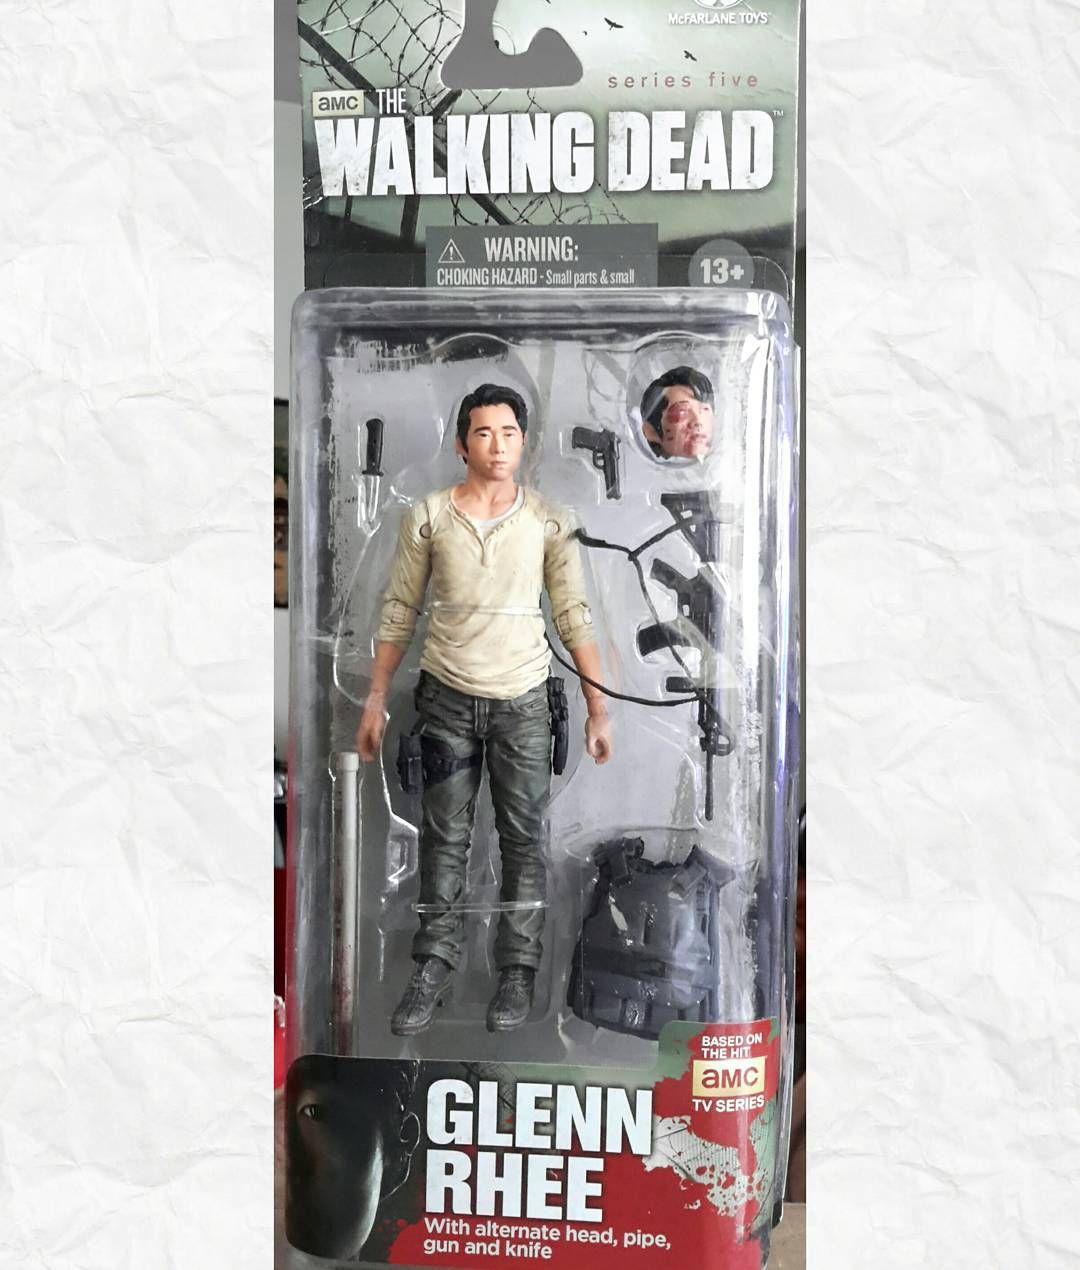 Mcfarlane walking dead series 6 daryl dixon action figure -  The Walking Dead Tv Show Series 5 Glen